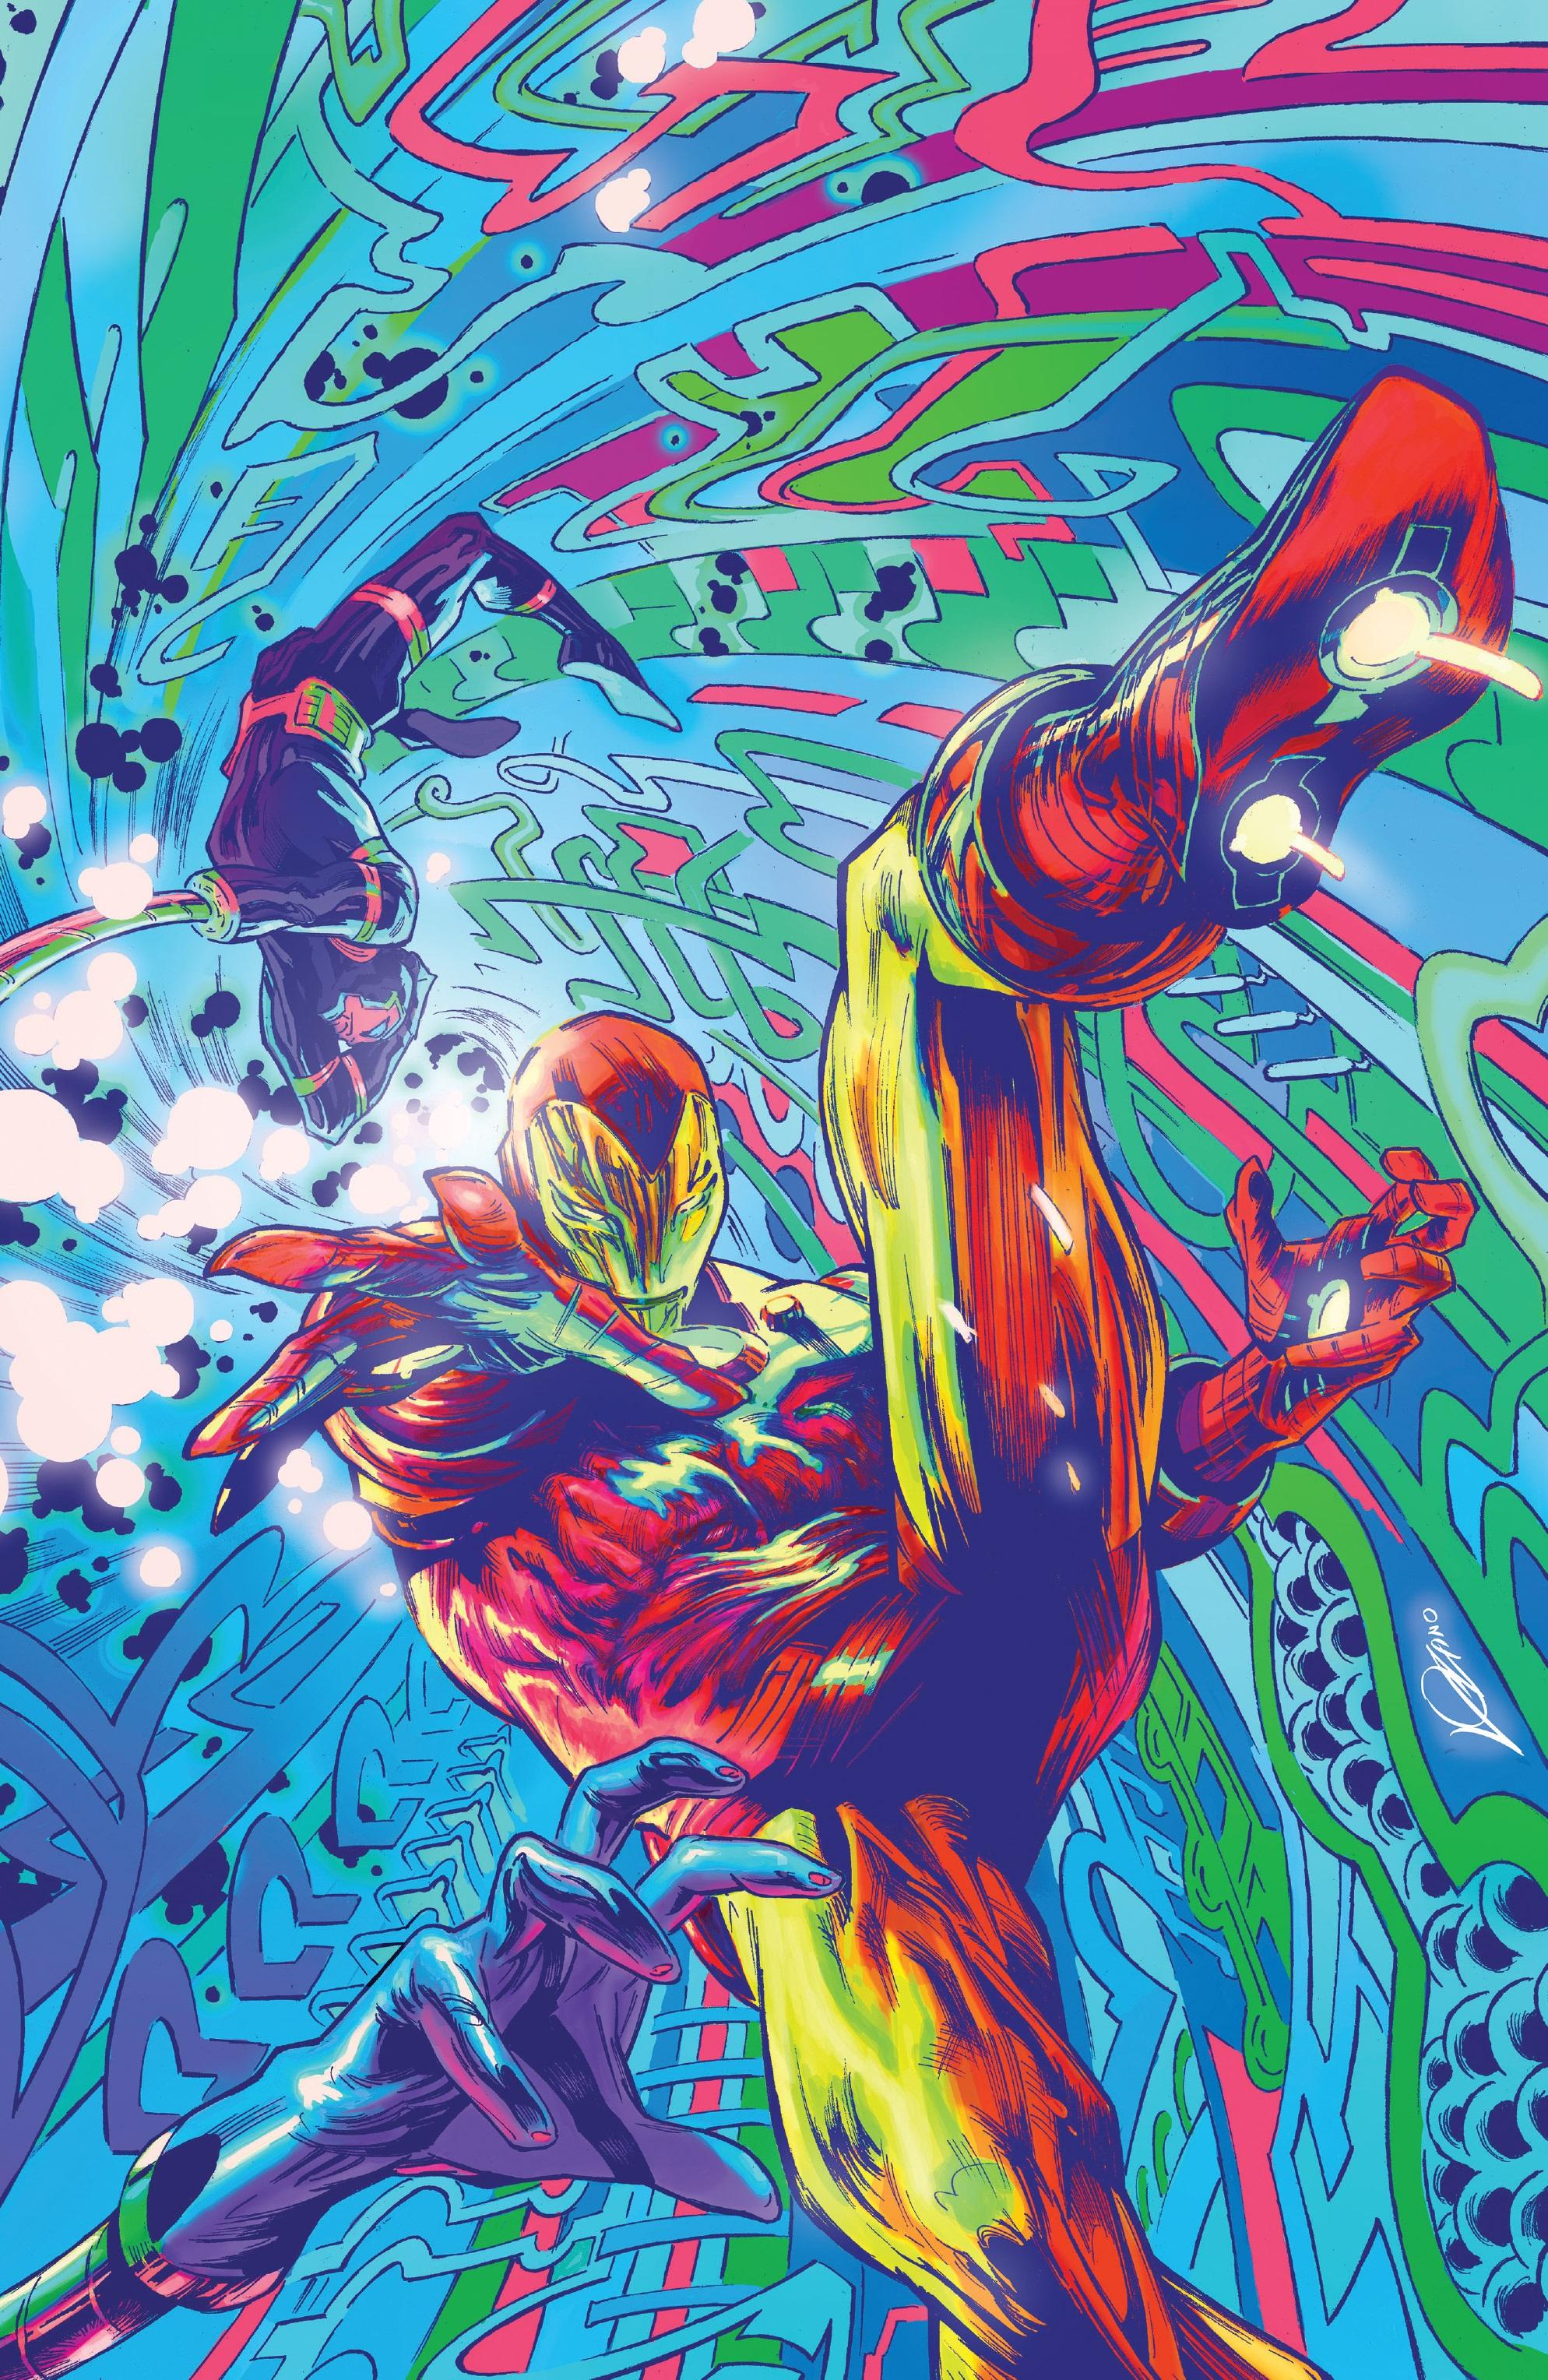 Tony Stark Iron Man Vol 1 3 Textless.jpg